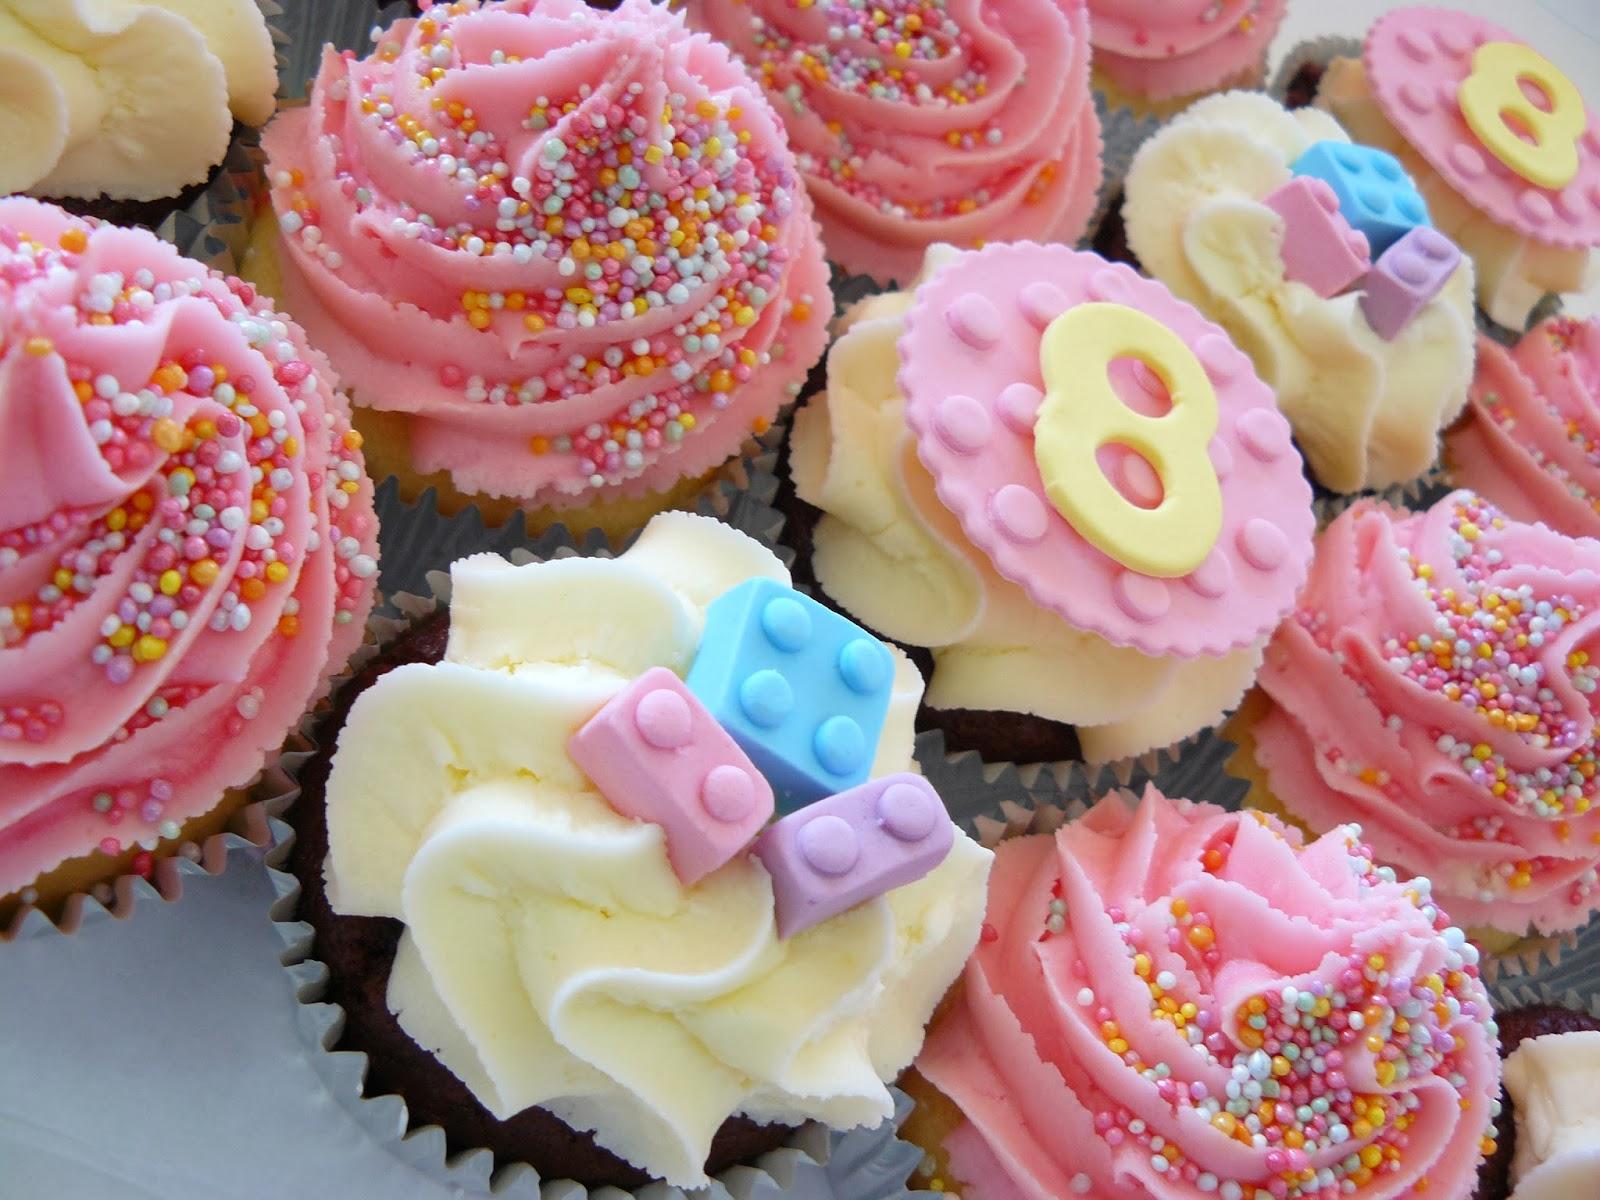 The Cup Cake Taste Brisbane Cupcakes Lego Friends Cupcakes